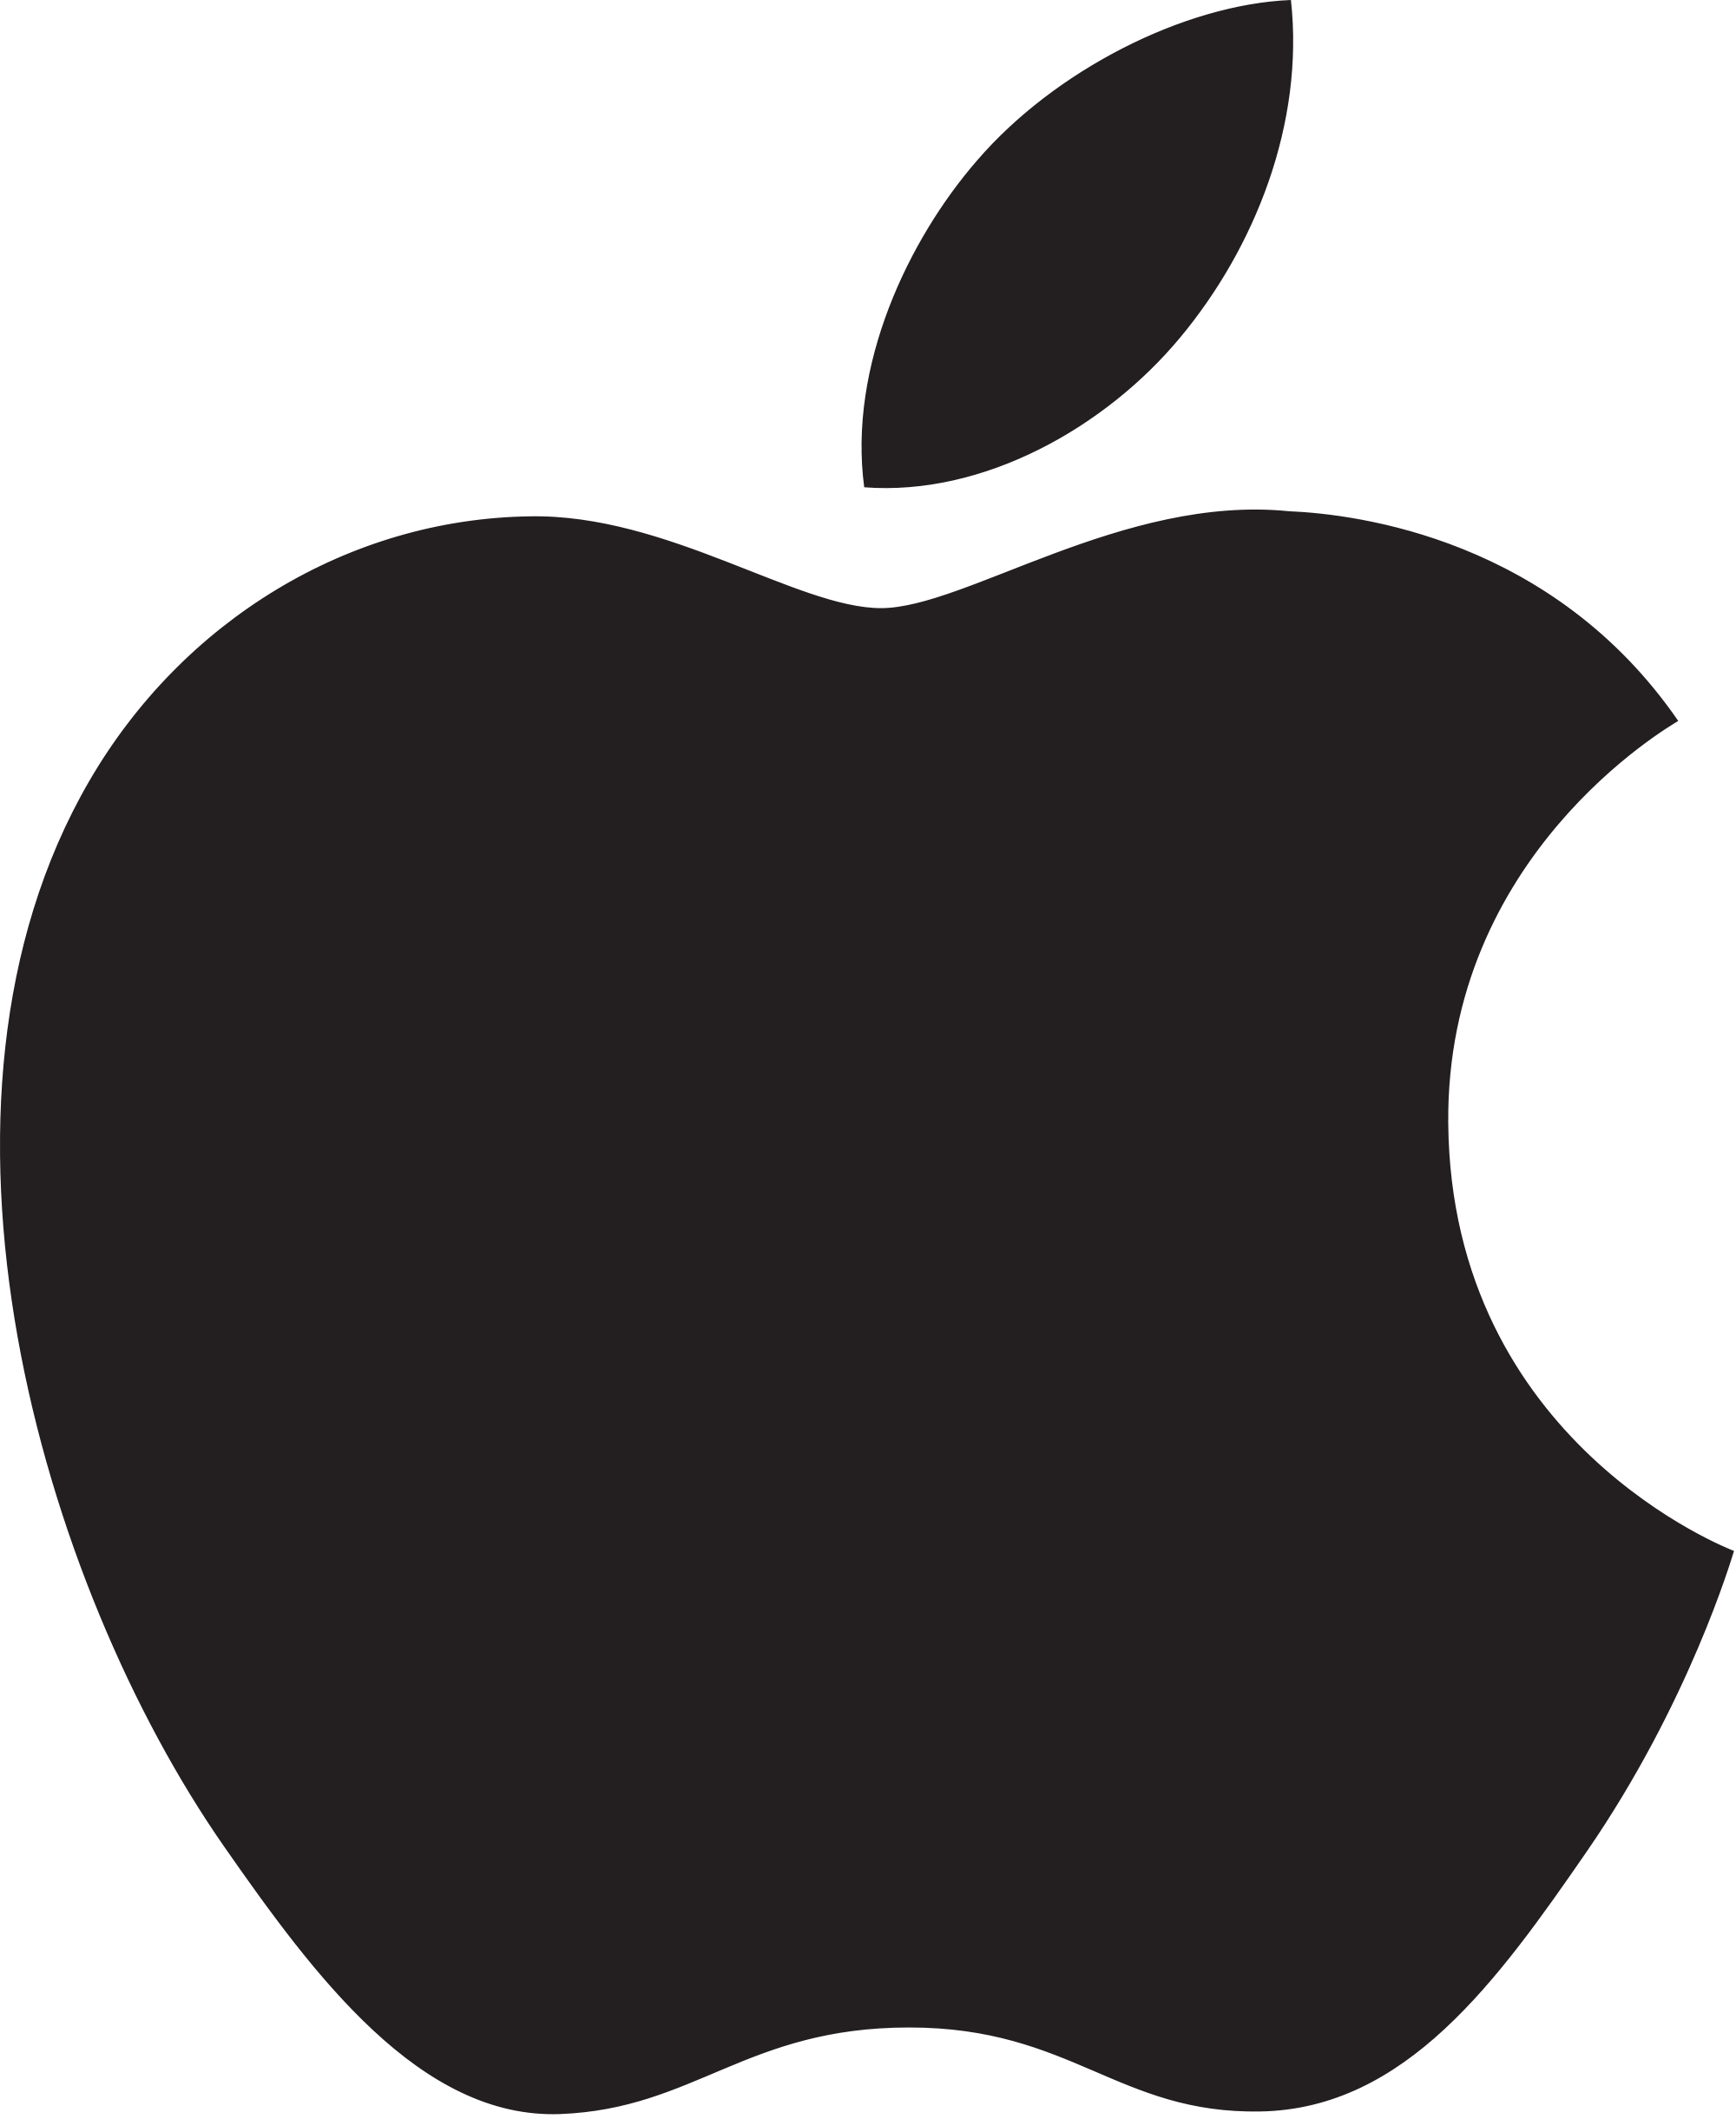 Apple Inc..